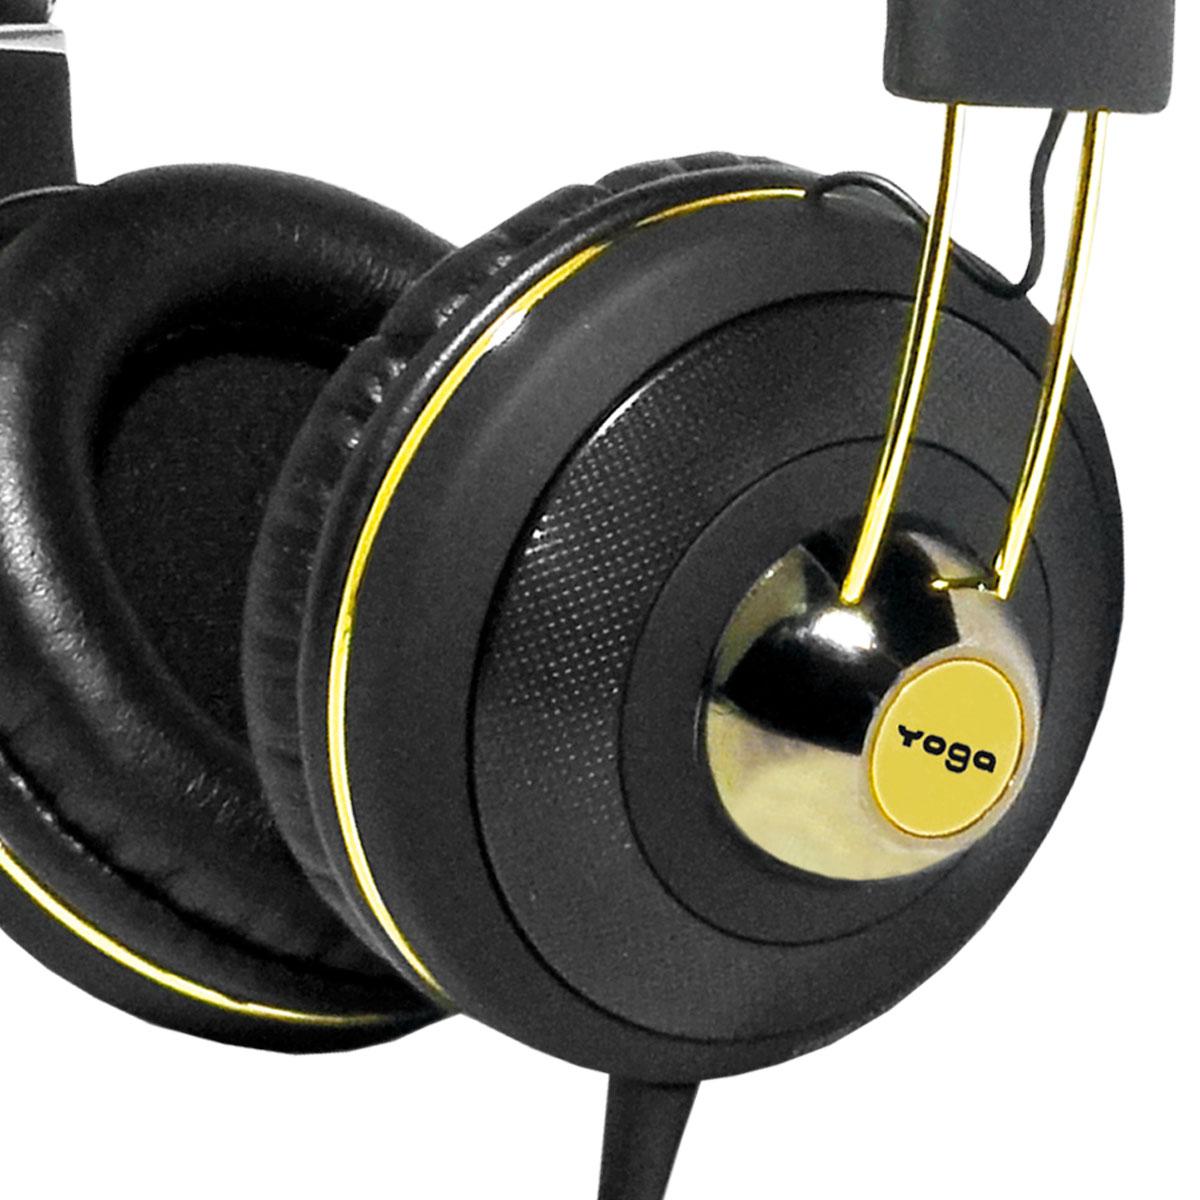 CD67 - Fone de Ouvido Over-ear CD 67 - Yoga